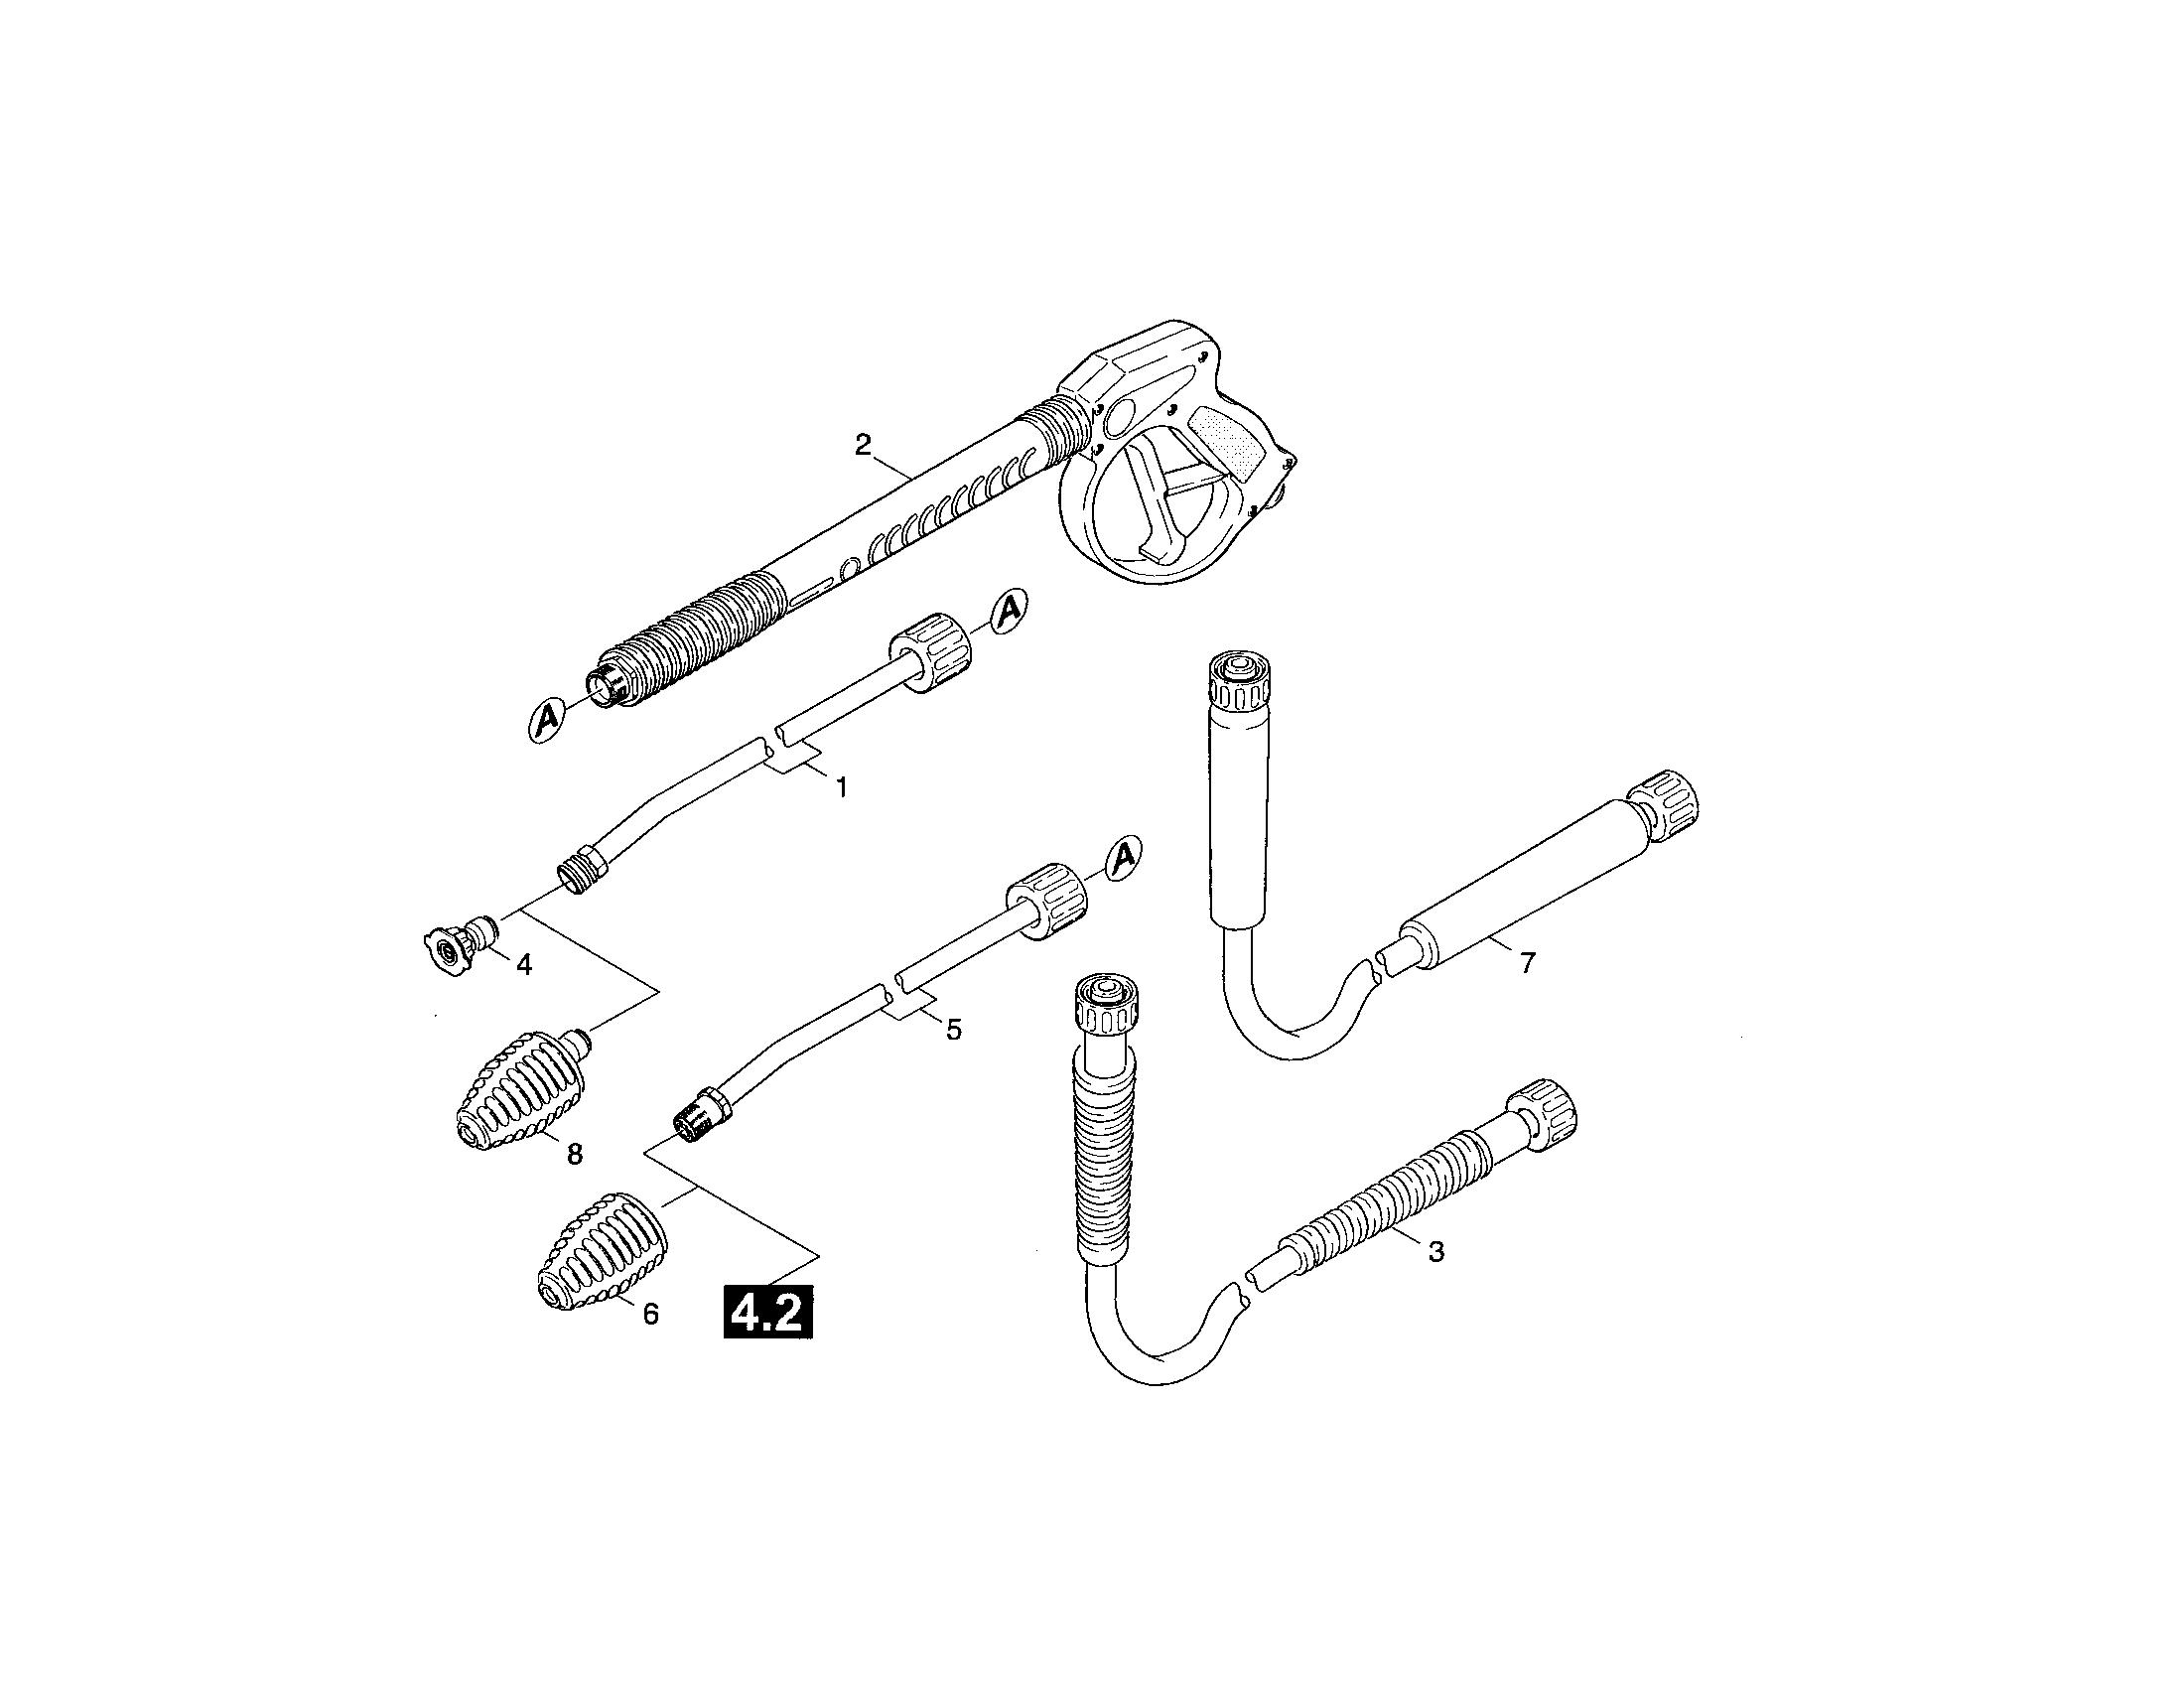 Karcher 2400 Psi Pressure Washer Parts Diagram